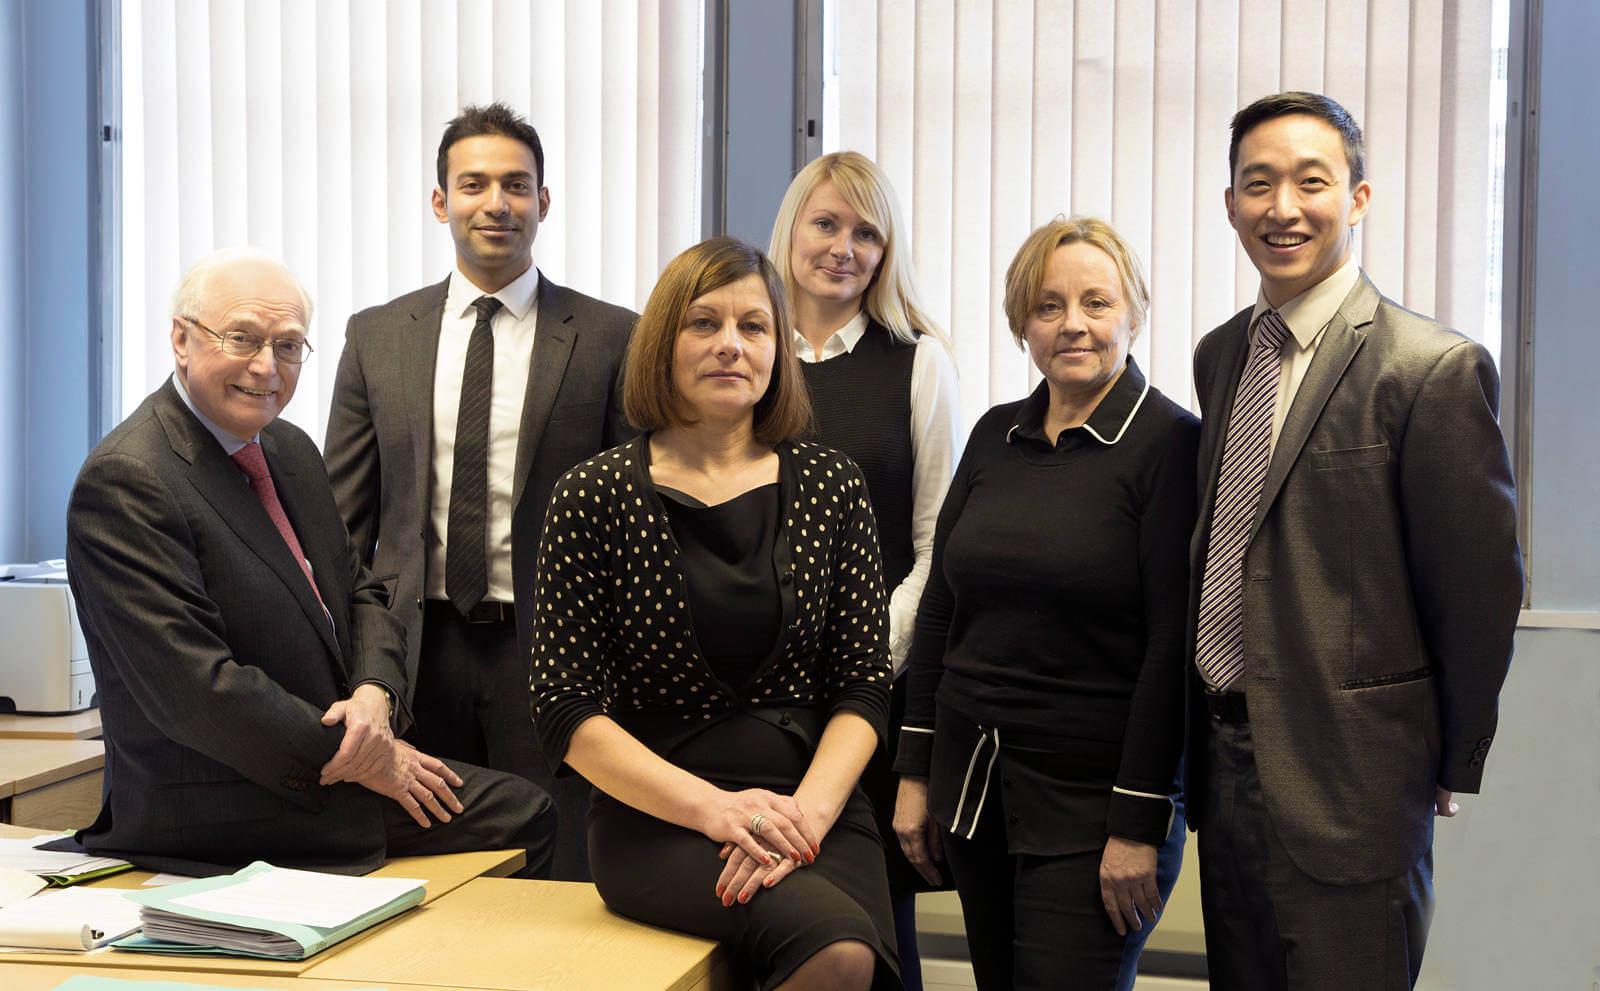 Accountants Wandsworth, Hammonds Chartered Accountants